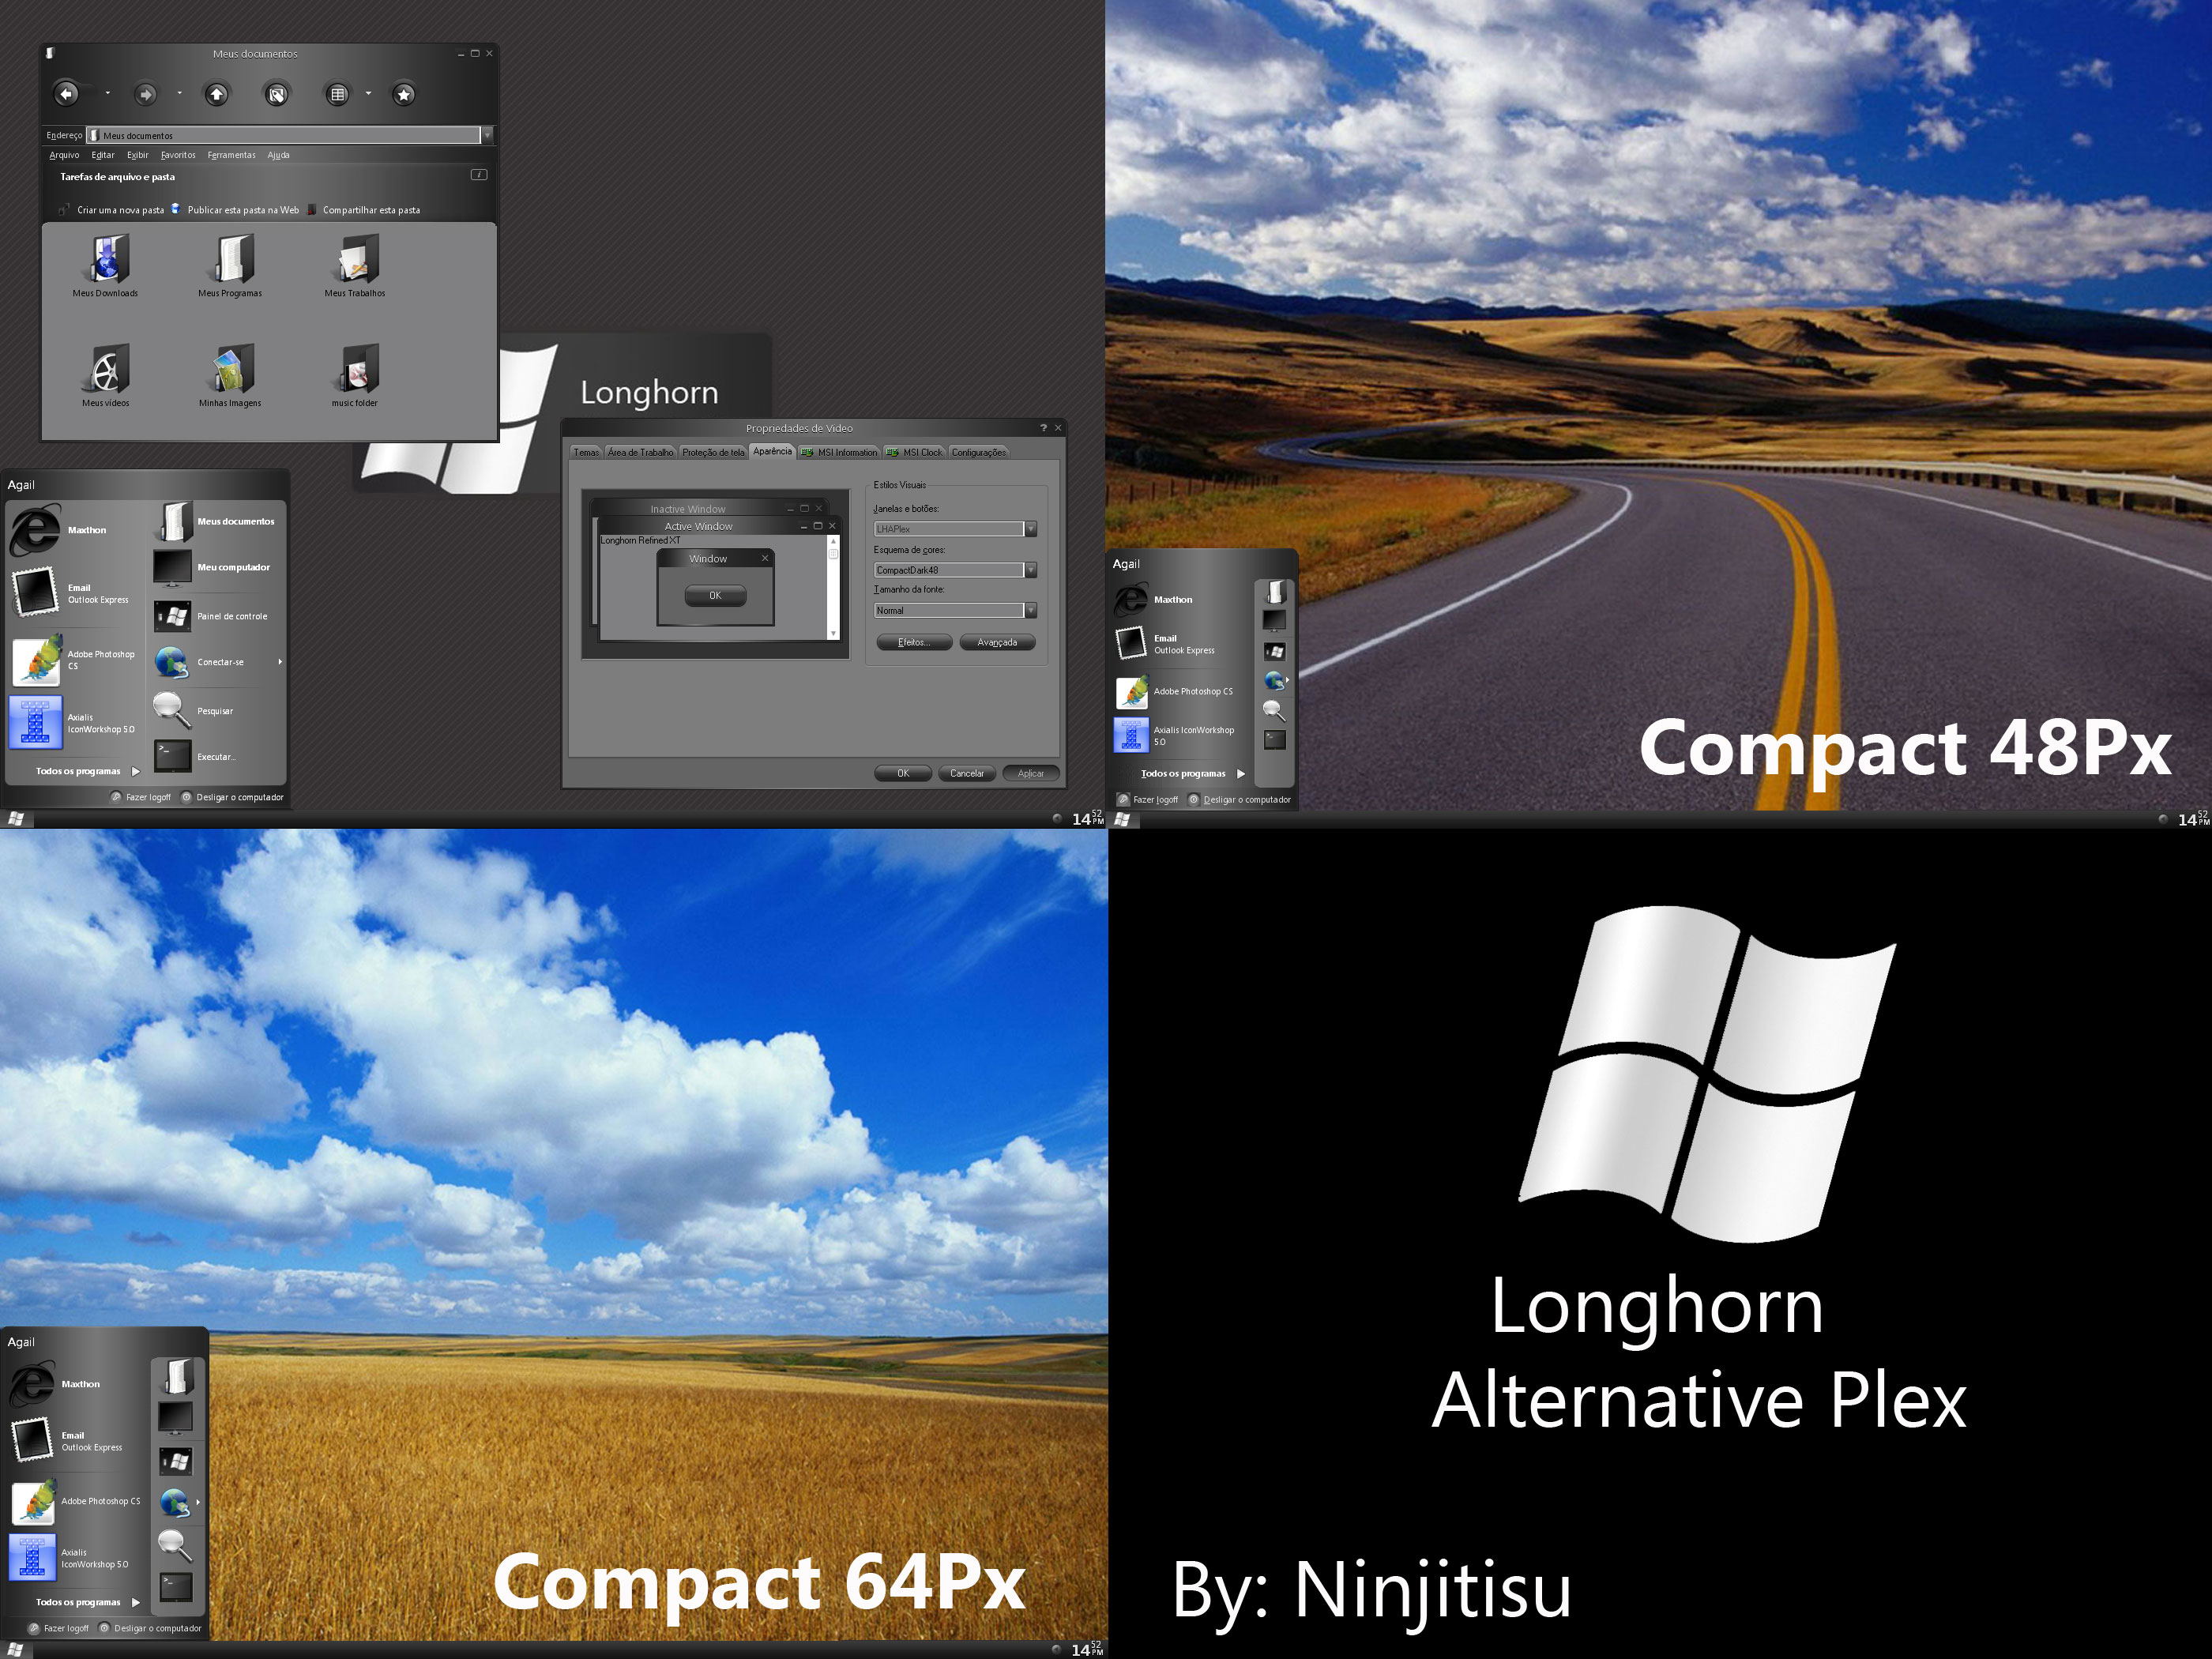 Longhorn Alternative Plex by Ninjitisu